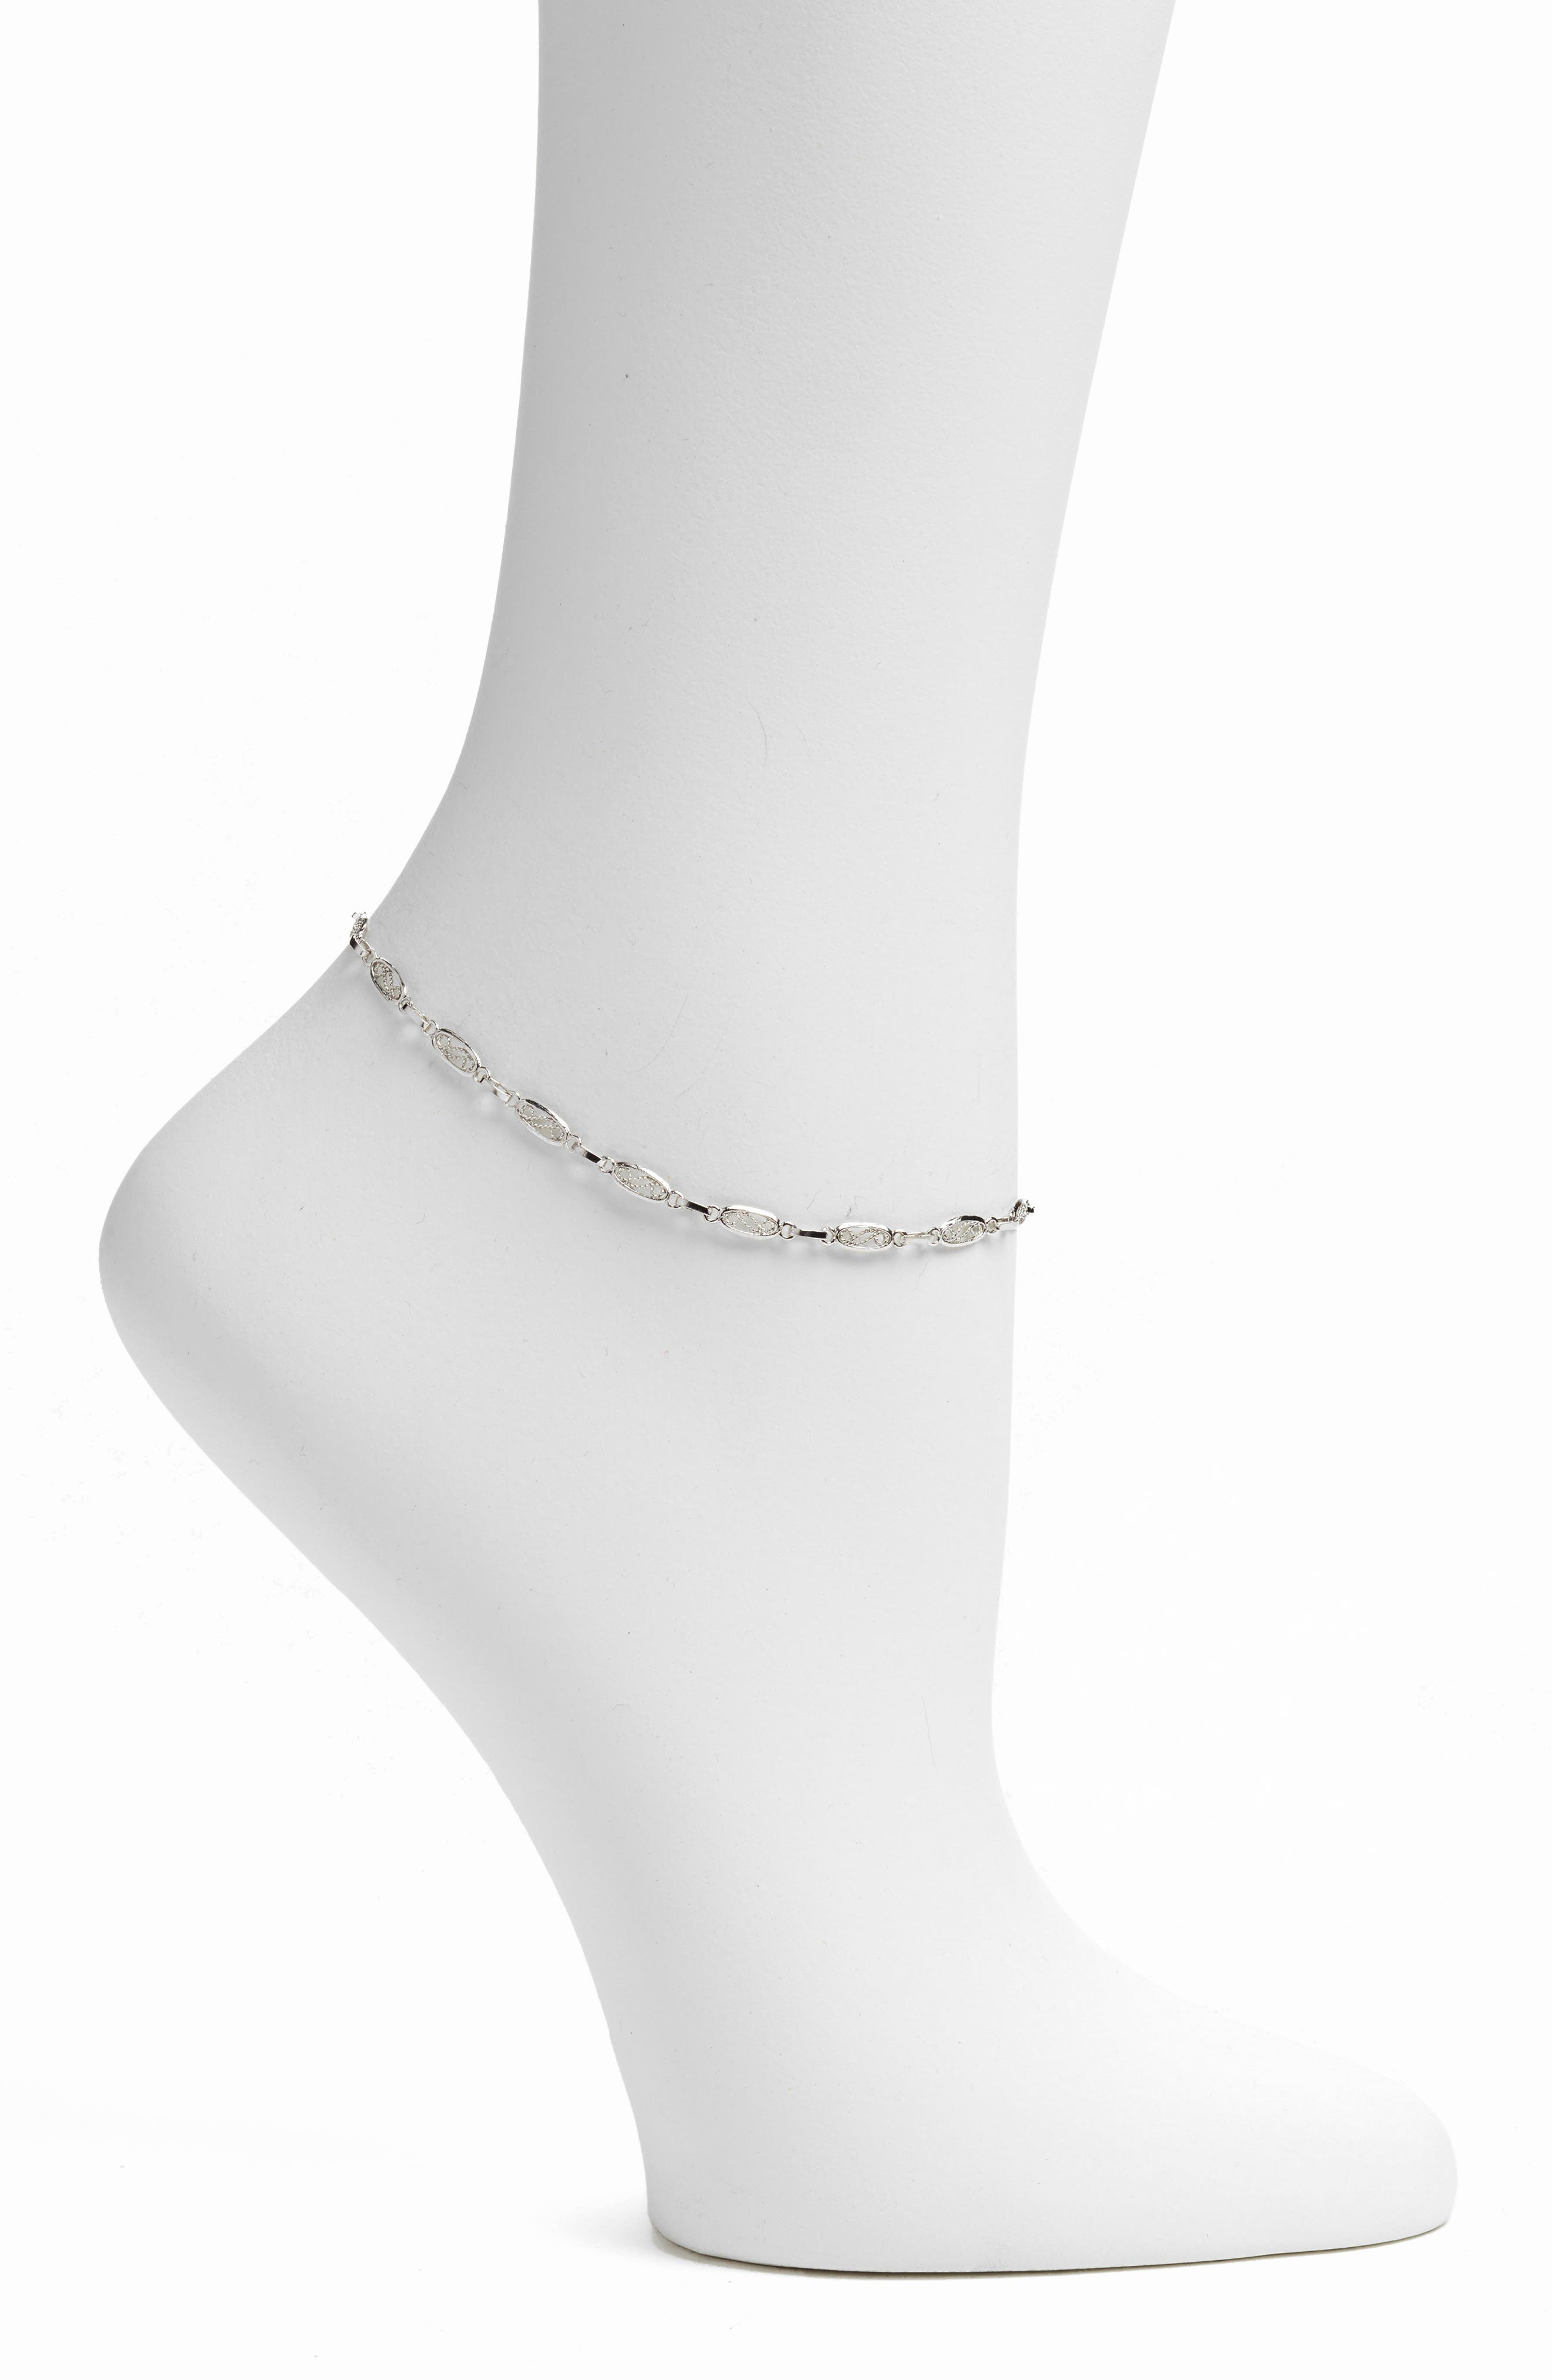 Javy Anklet,                         Main,                         color, 040